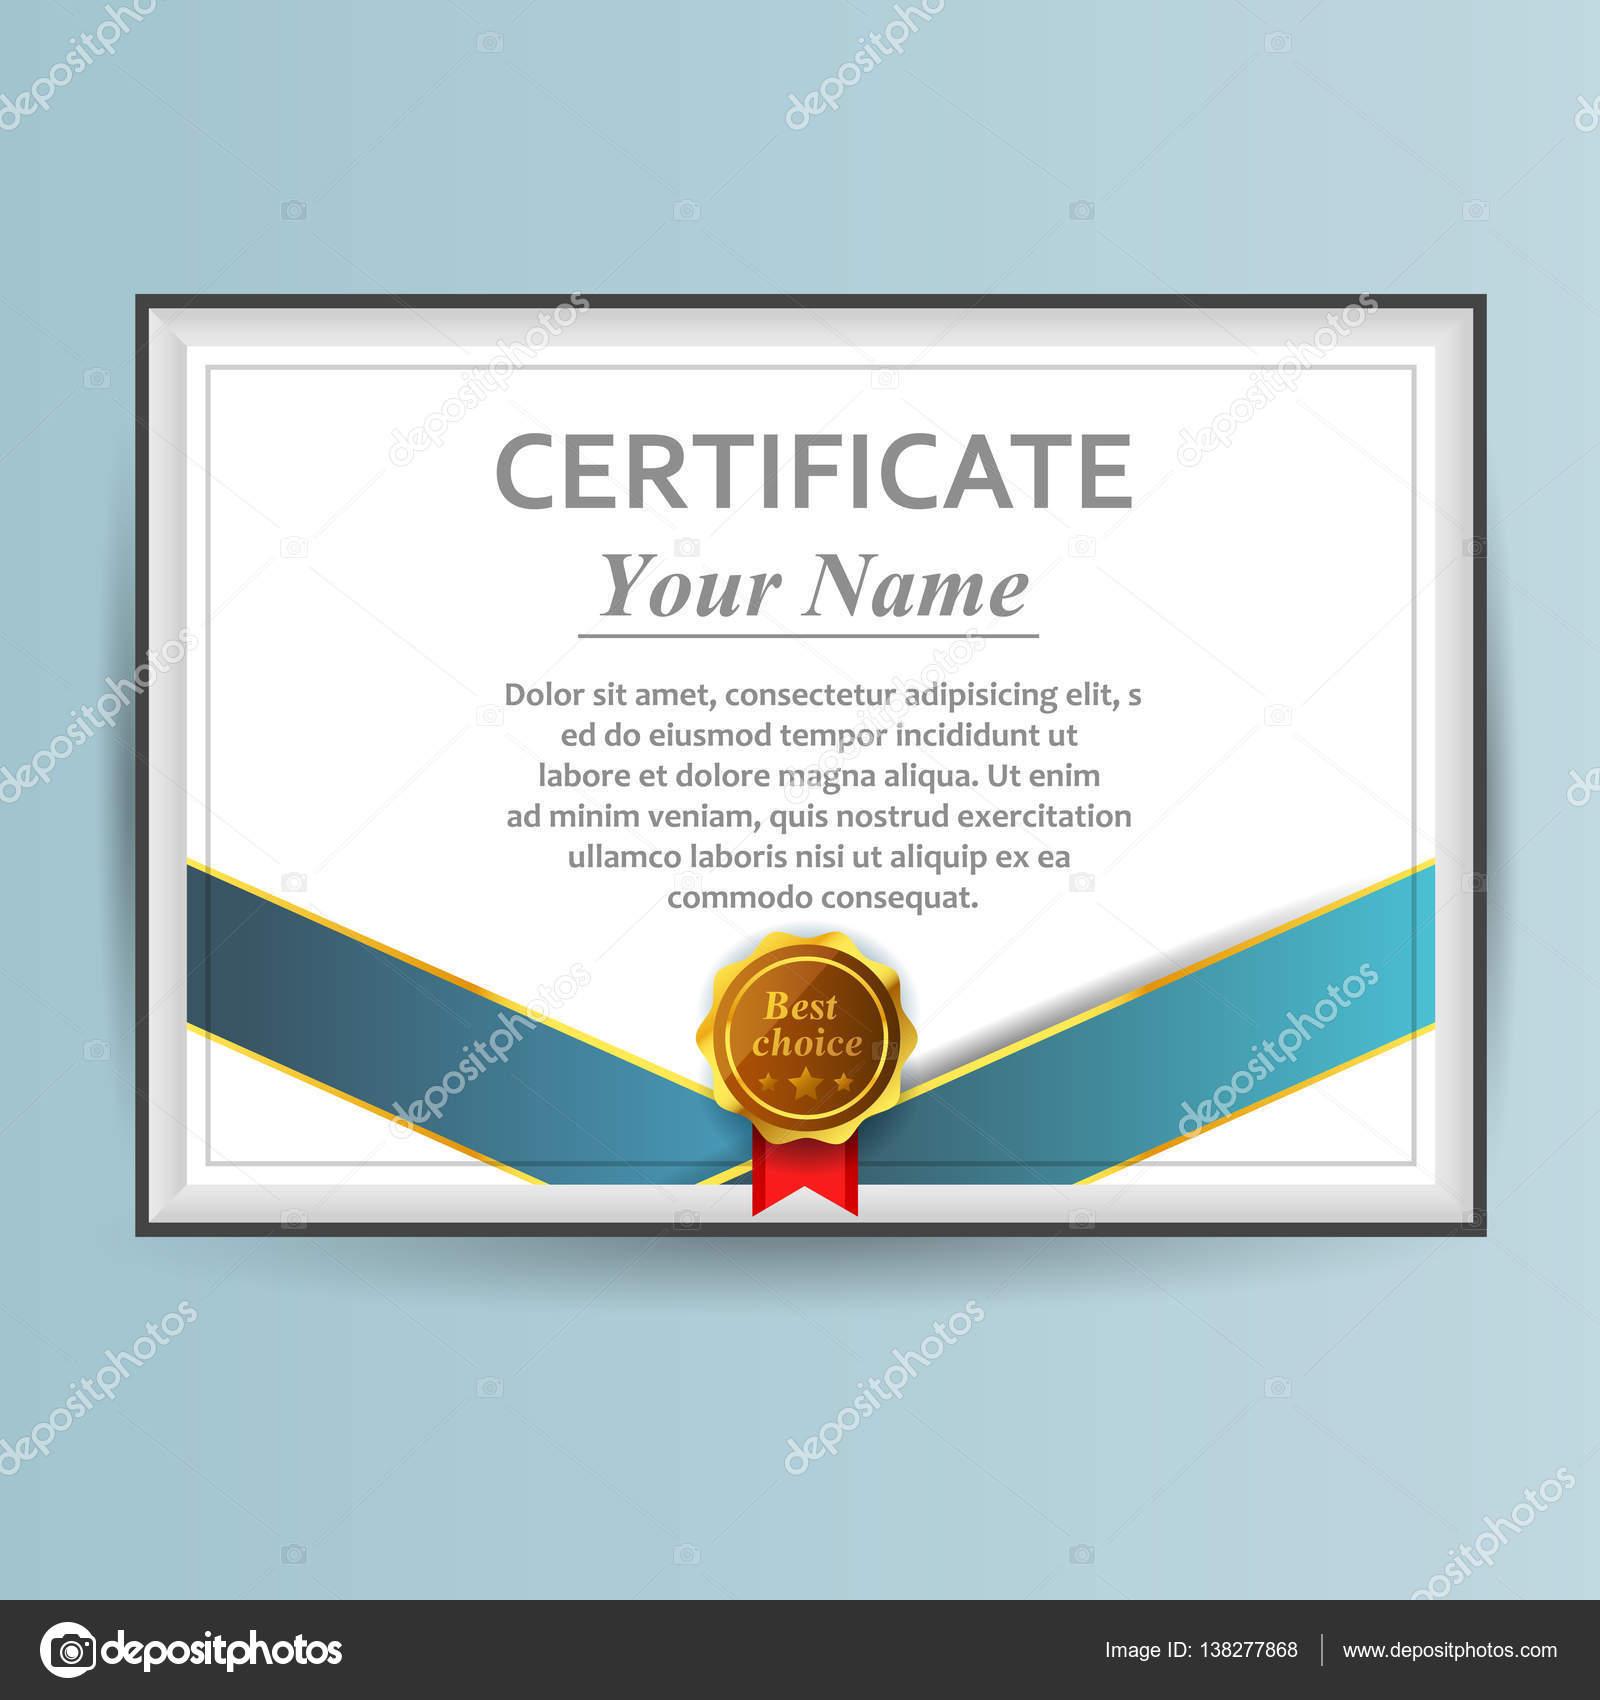 Vektor-Zertifikat-Vorlage. Design-Business-Award-Lösung ...